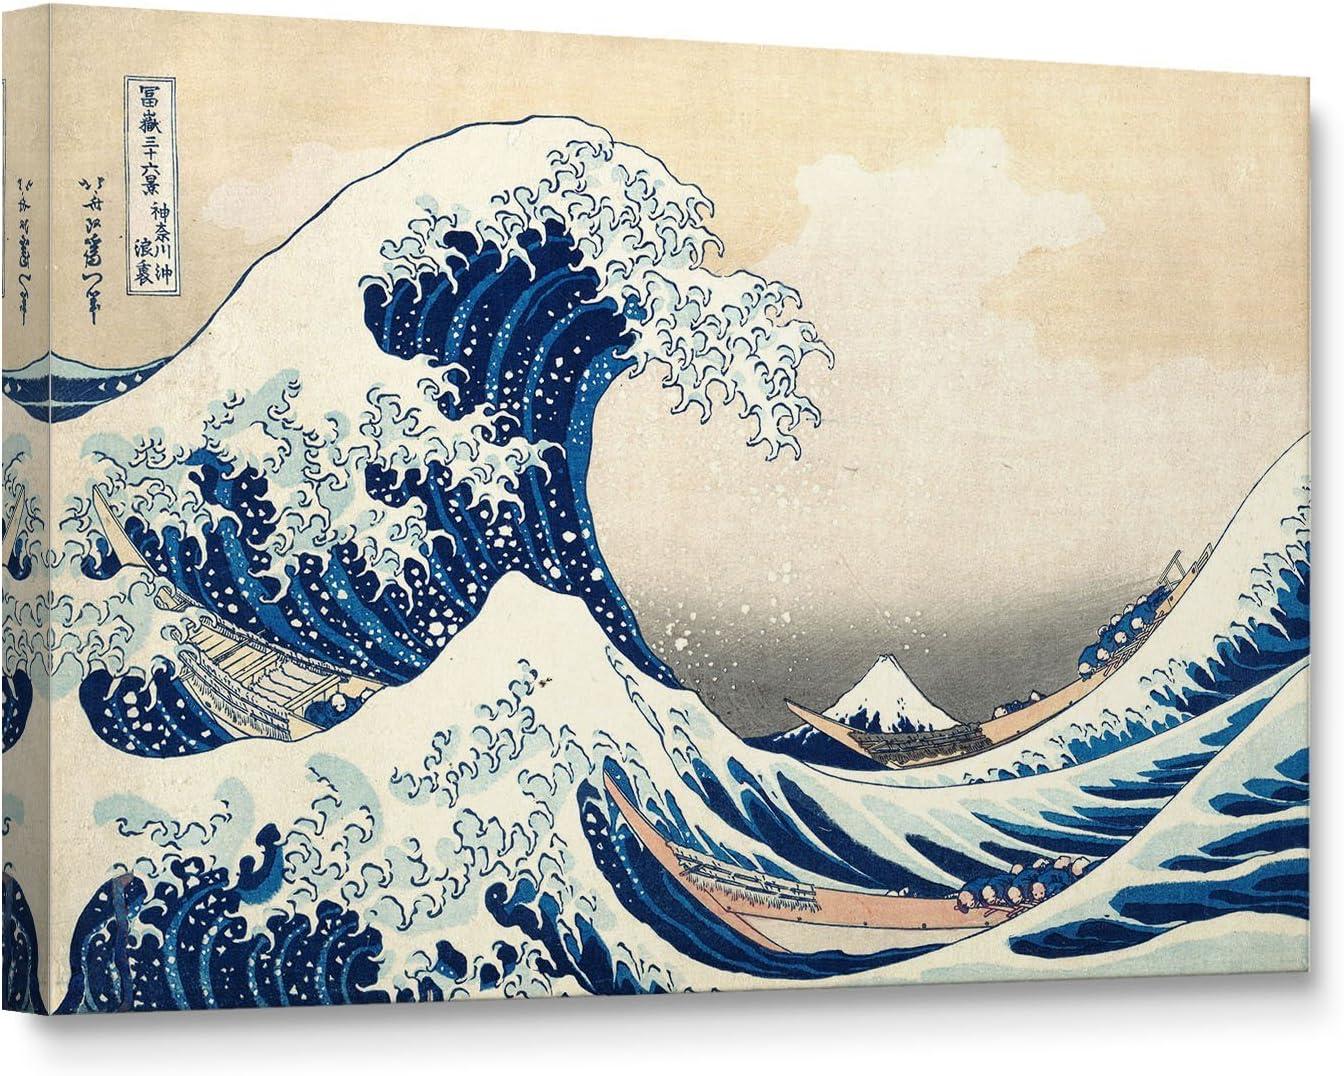 Niwo ART TM - The Great Daily bargain sale Directly managed store Wave Kanagawa Hokusa Off by Katsushika